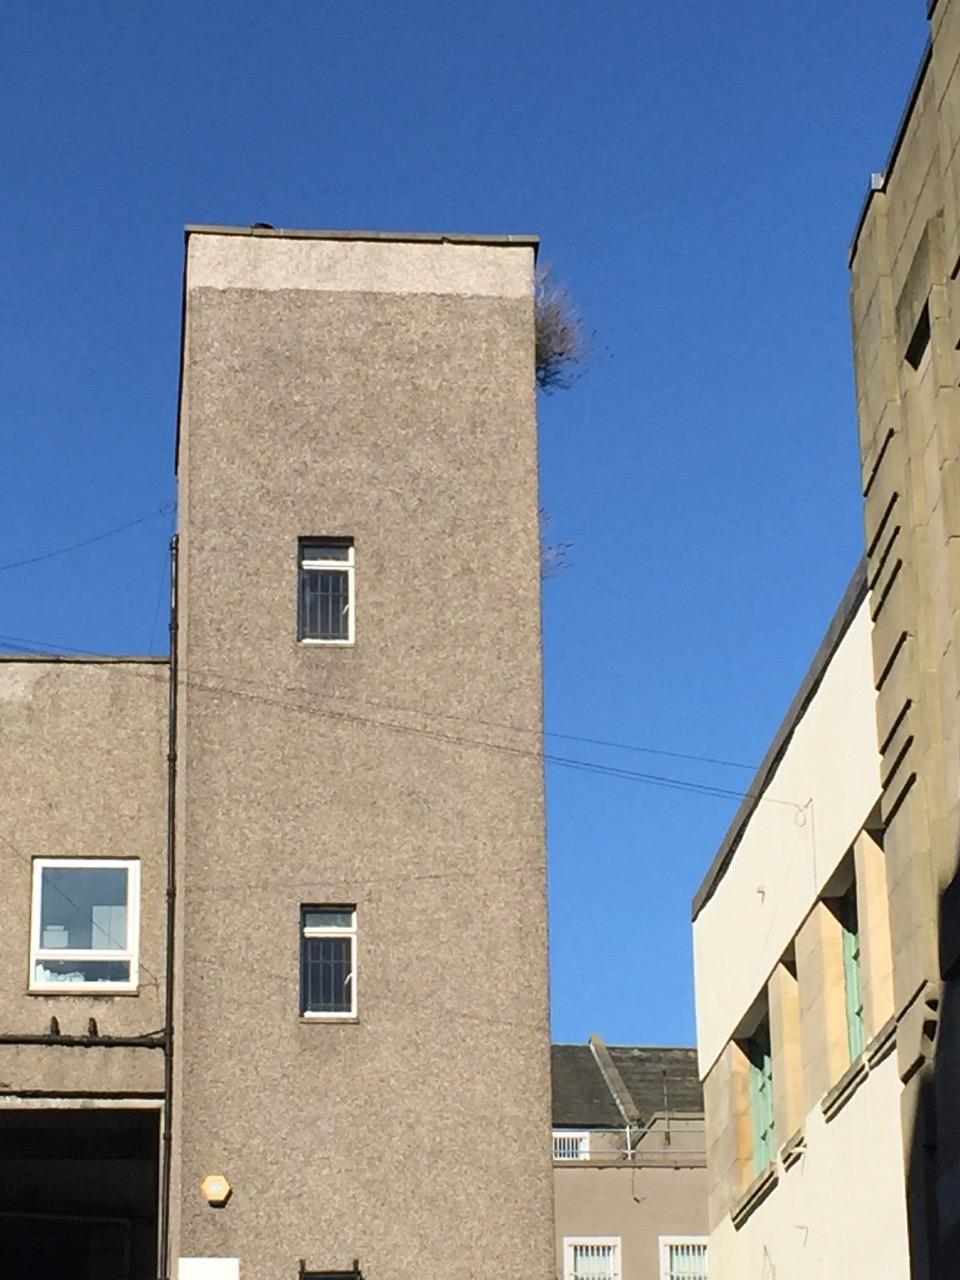 concrete building blue sky